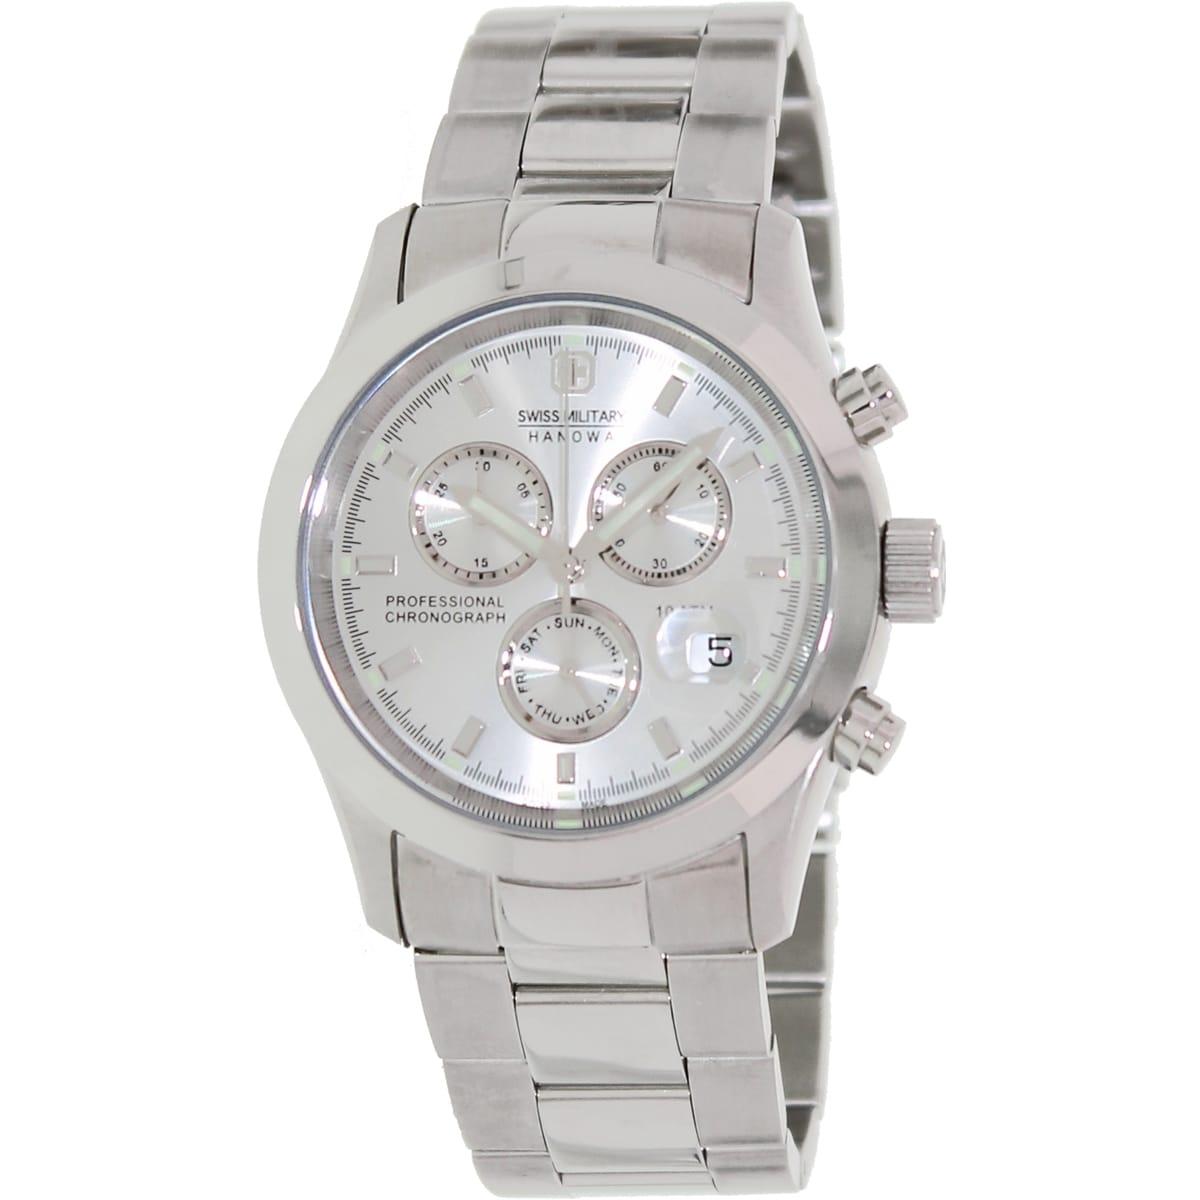 Swiss Military Hanowa Women's Freedom 06-5115-04-001 Silvertone Stainless Steel Swiss Chronograph Watch with Silvertone Dial